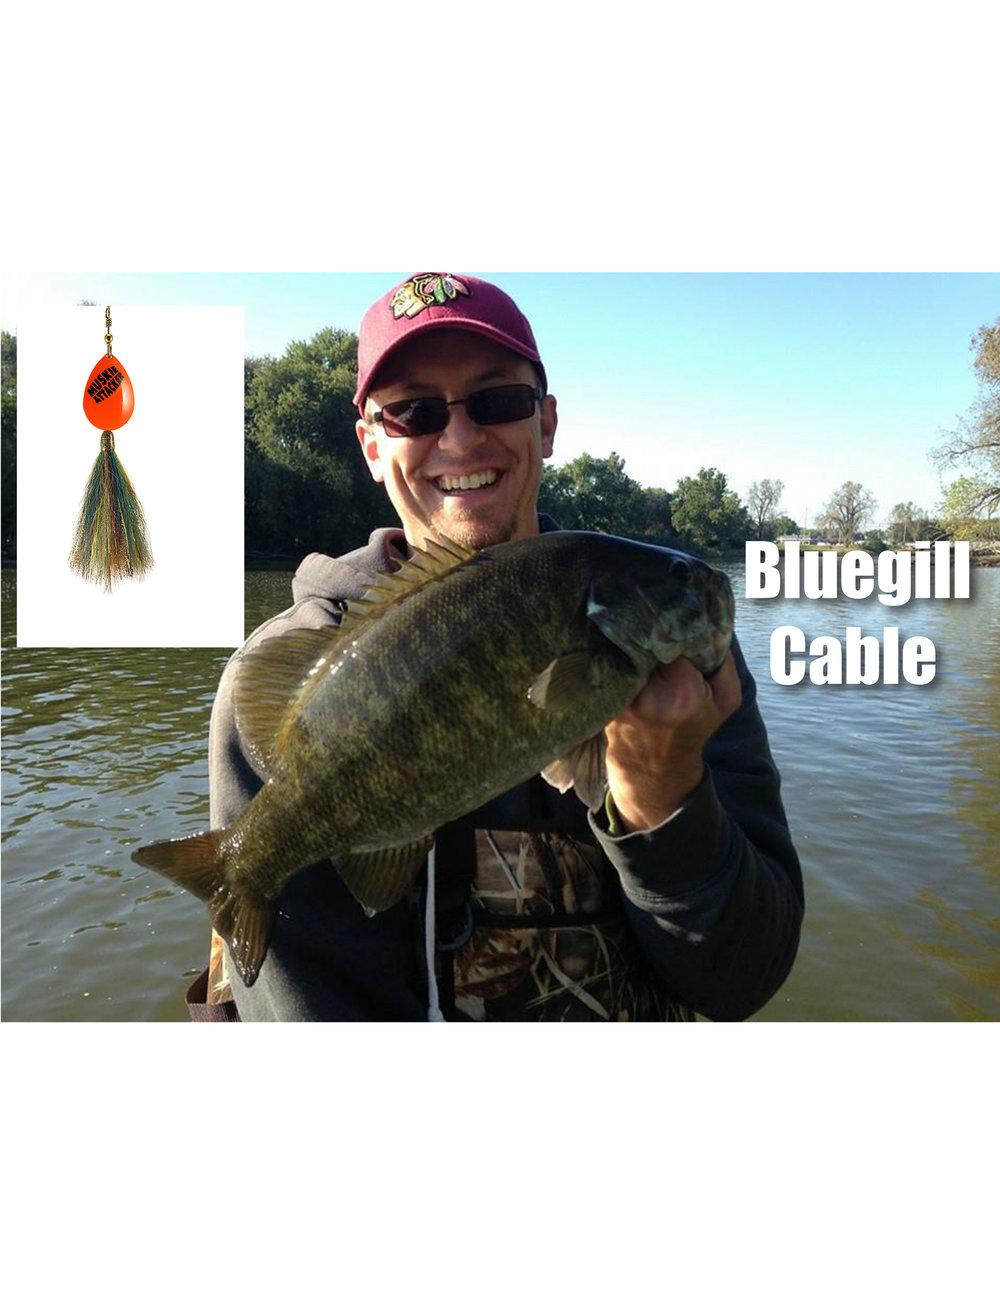 bluegill cable.jpg